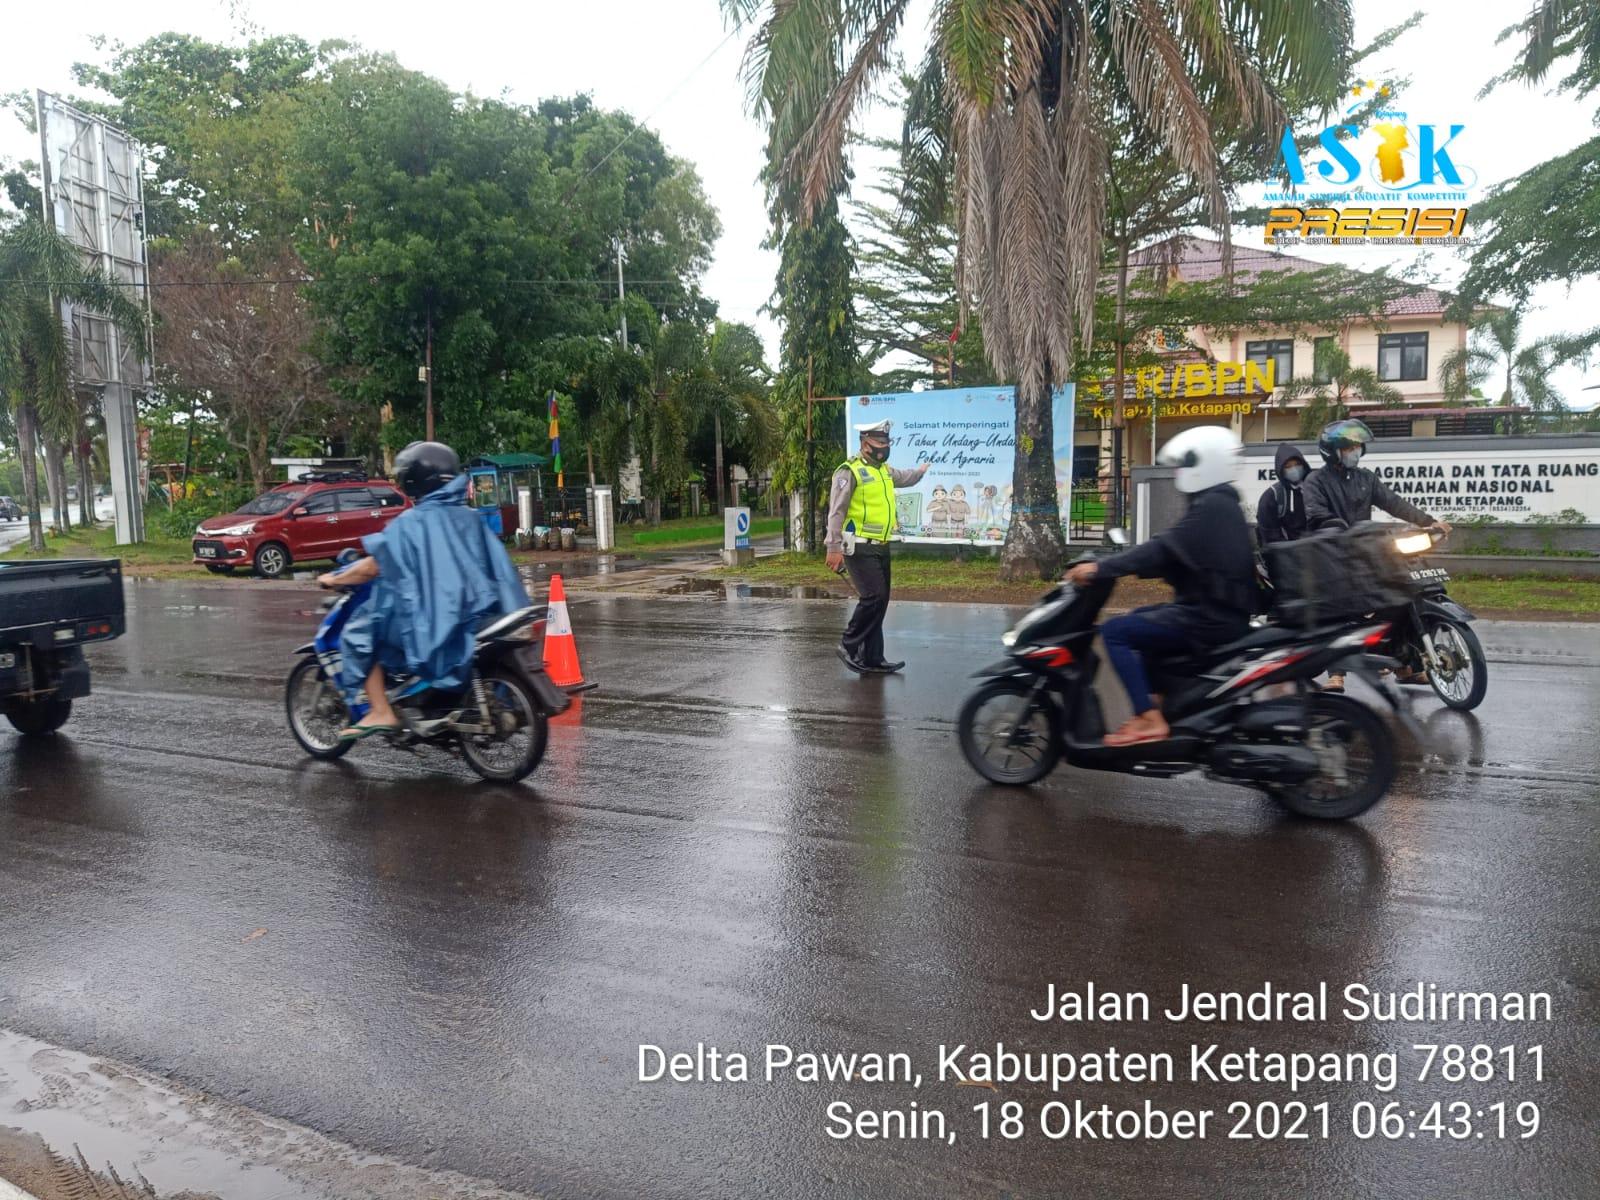 Kurangi Kecepatan Kendaraan Anda Saat Cuaca Hujan dan Jalan Licin